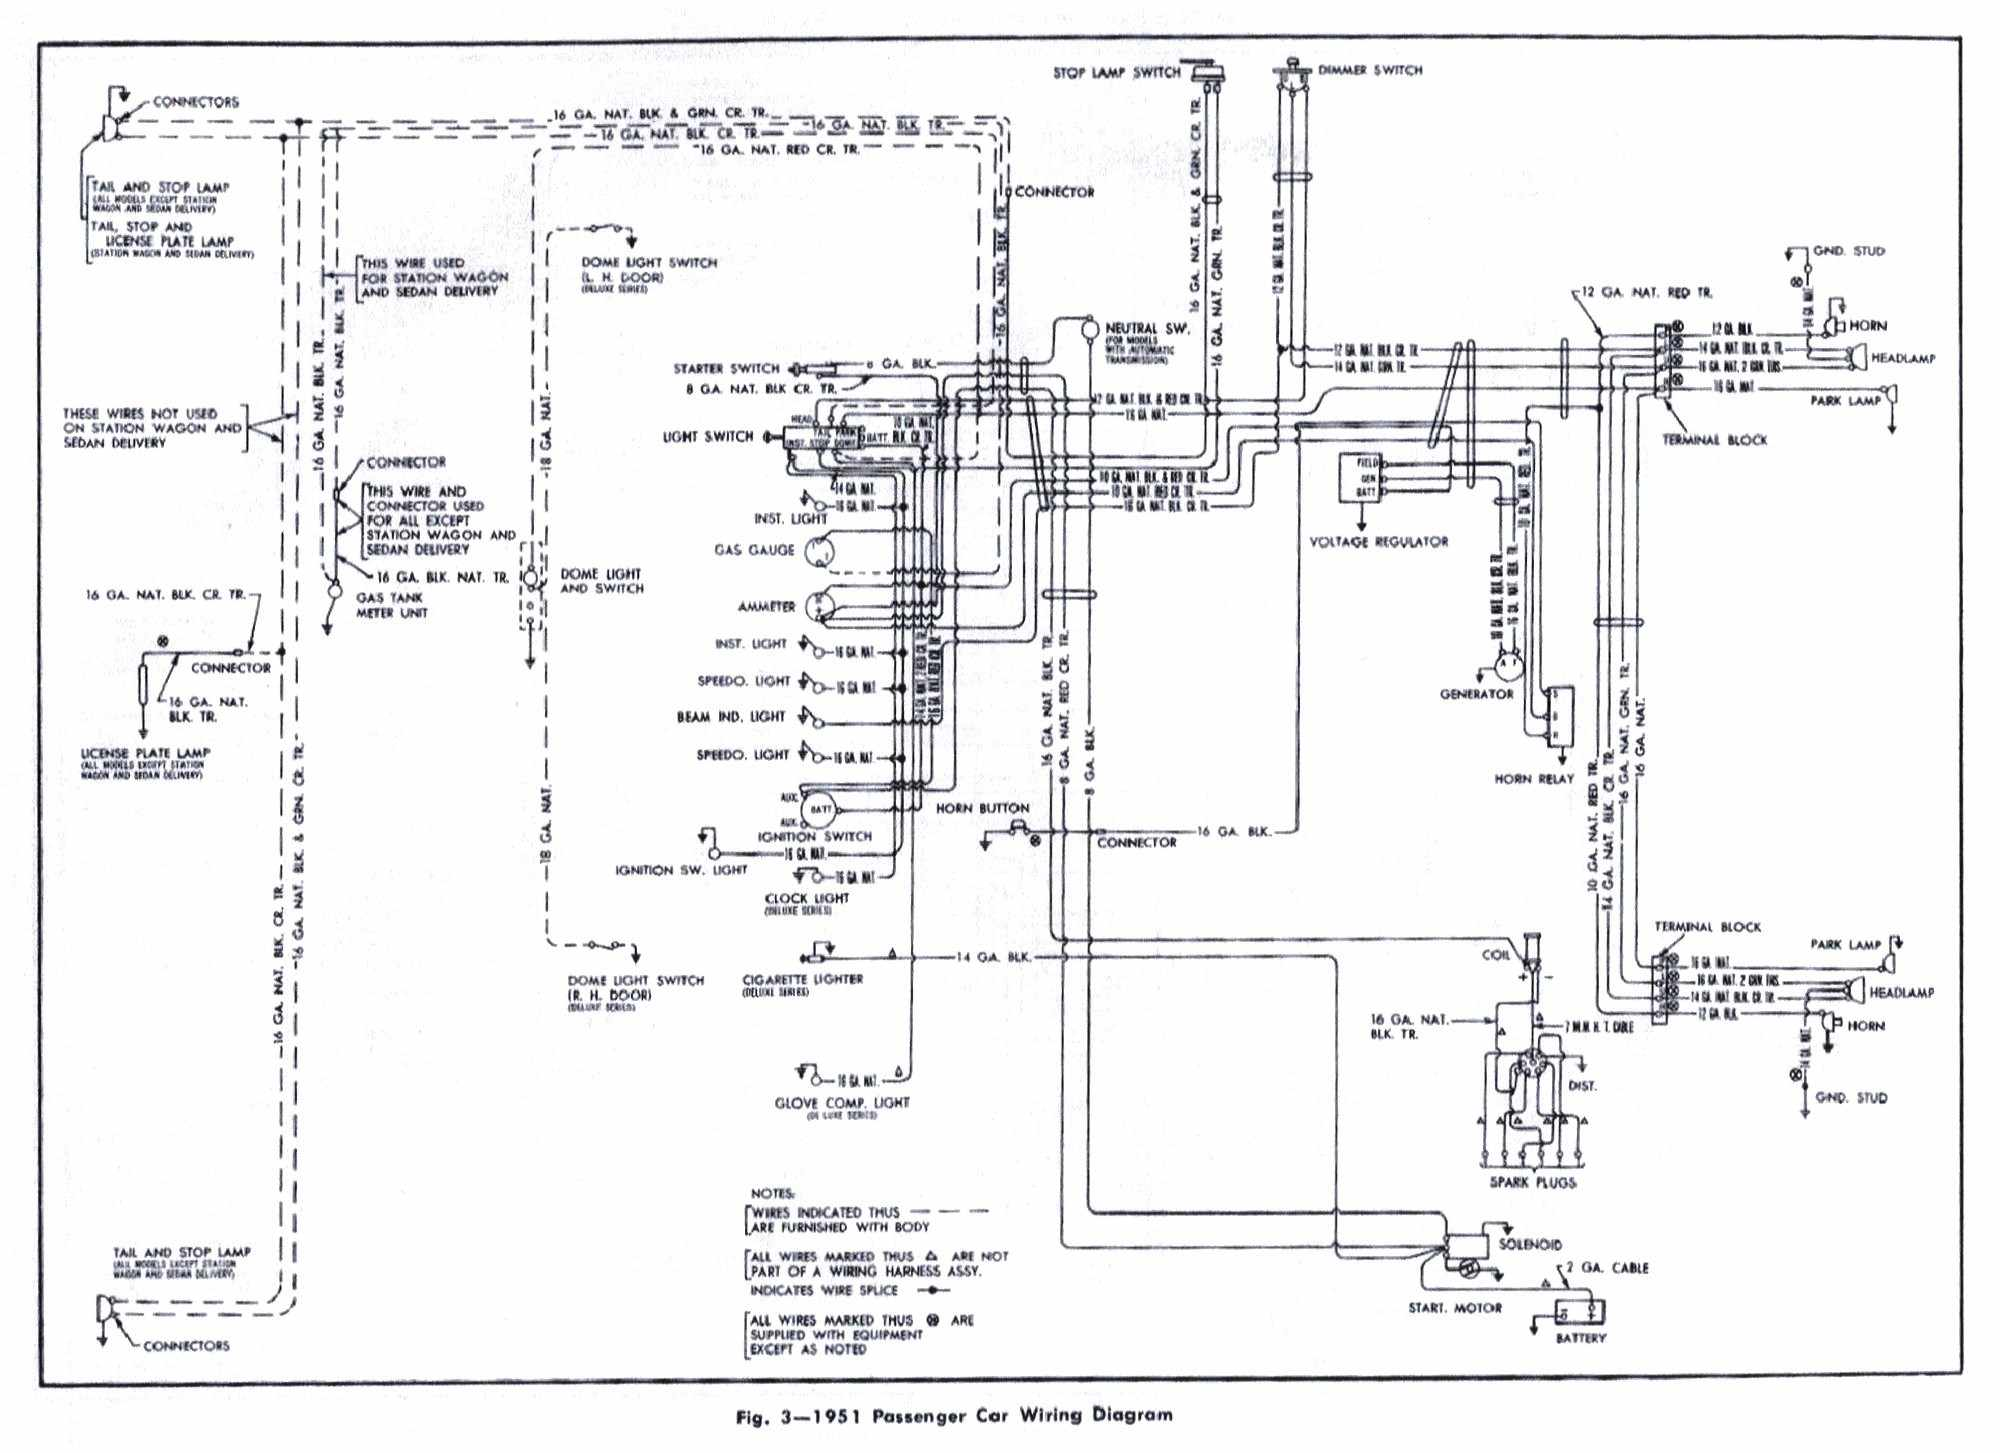 Man Trap Wiring Diagram Free Download Schematic Mars 10464 1951 Simca Diagrams U2022 Rh Arcomics Co